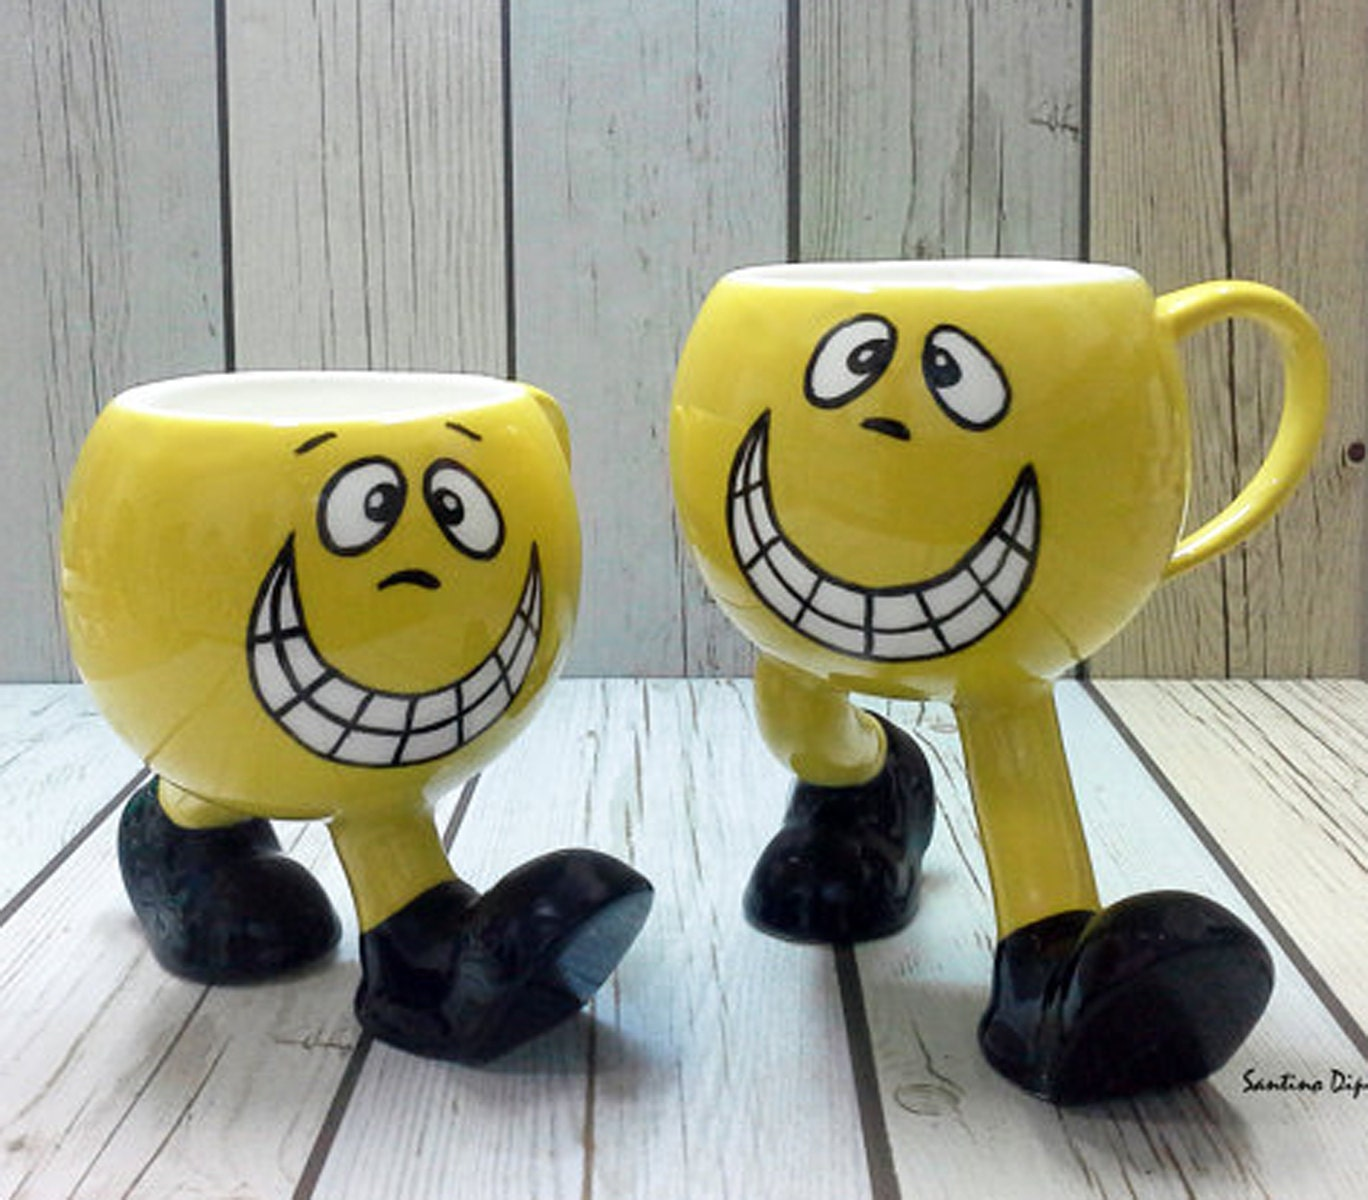 Smiley Face Coffee Mug Emoji Mug Set Pair Of Funny Smiley Face Cups Novelty Mug